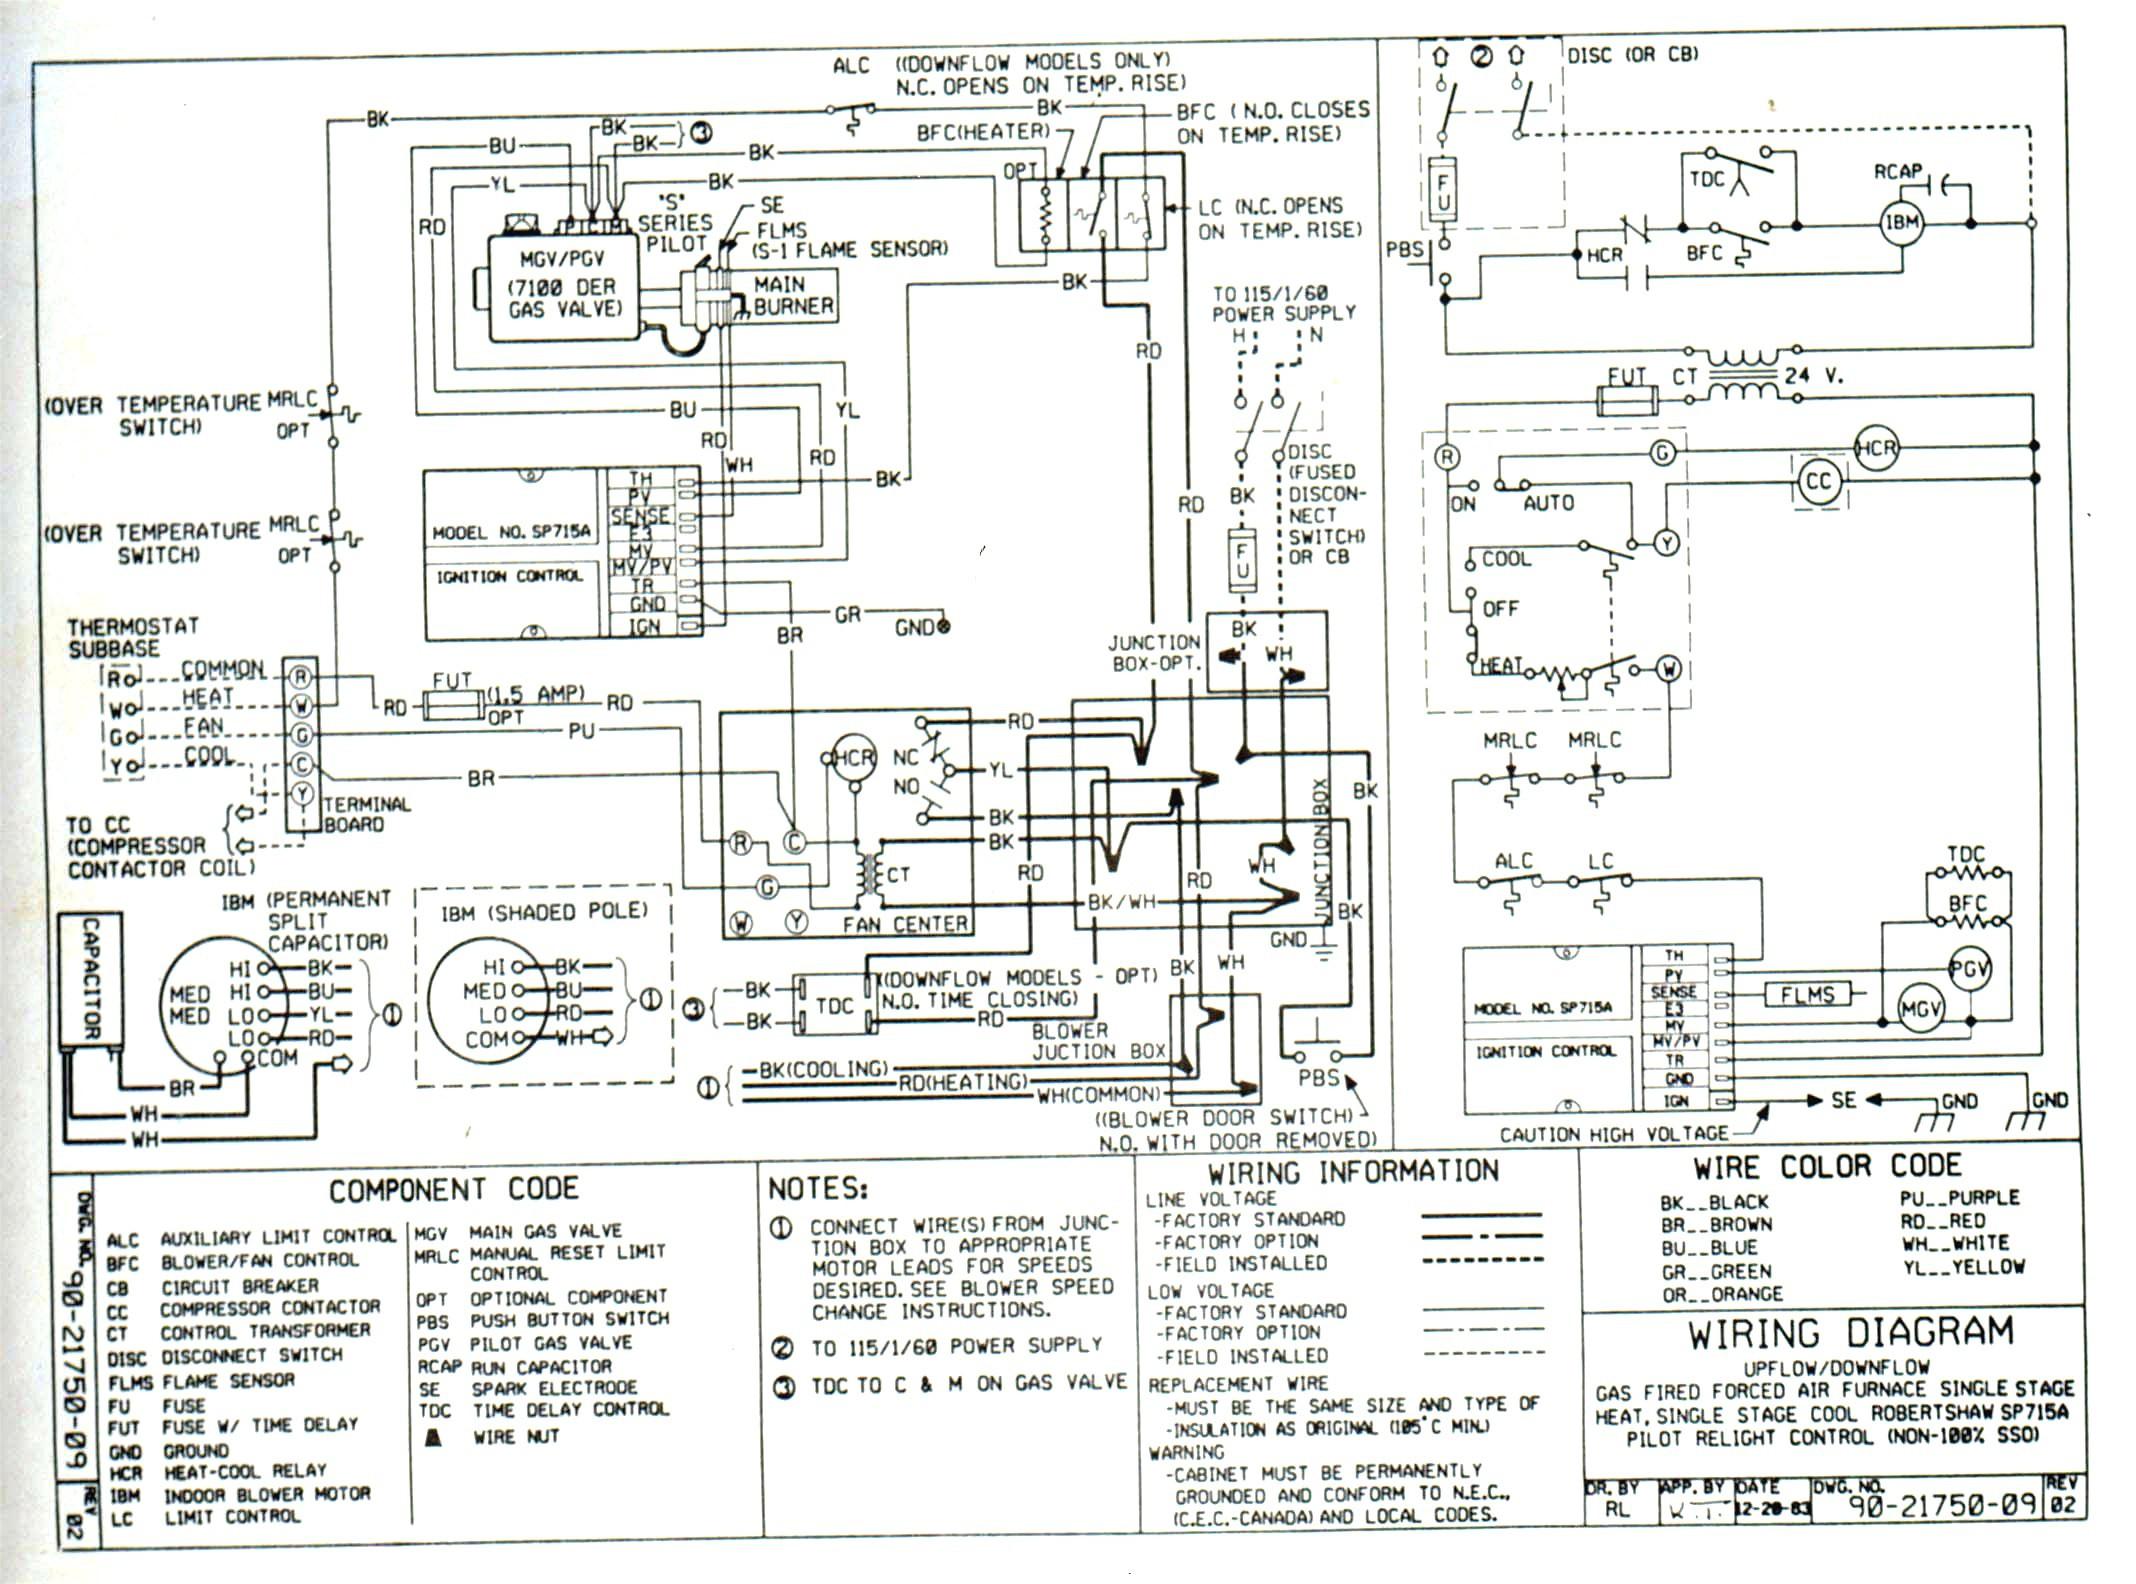 Ac Compressor Wiring Detailed Schematic Diagrams Fac Diagram 150 Intertherm Wwwautoacforumcom Rv Electrical